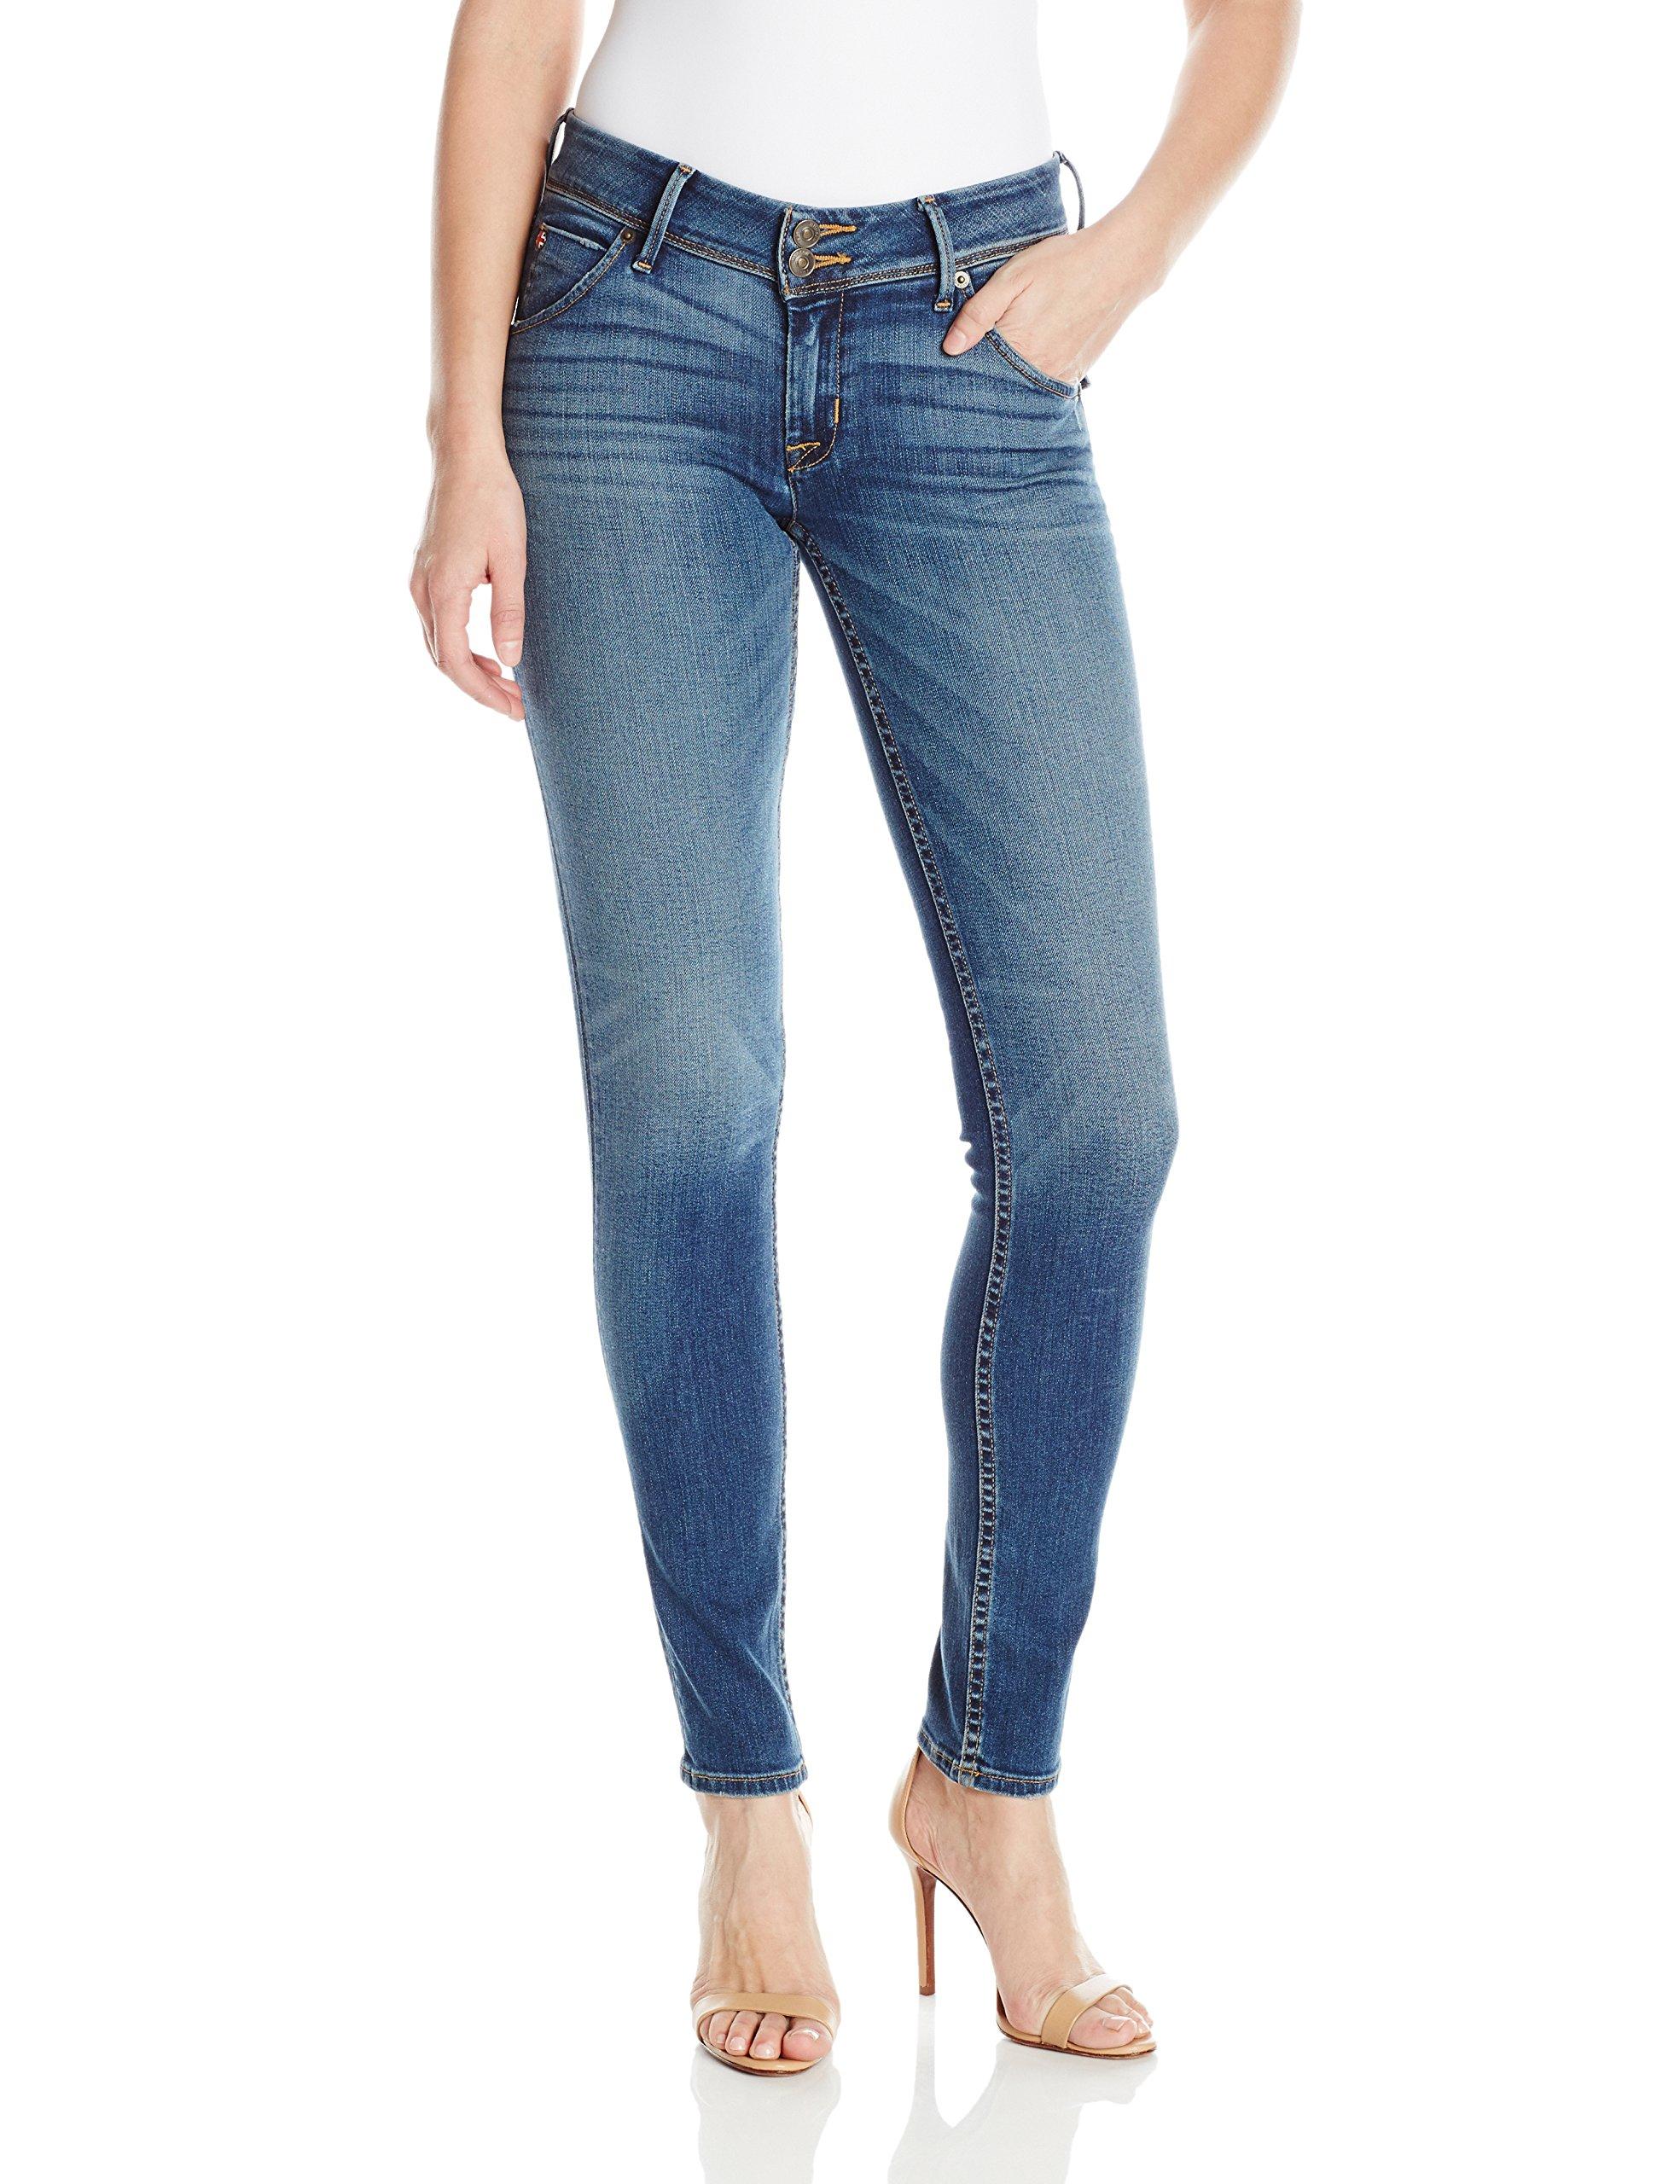 276af574e52 Galleon - Hudson Jeans Women's Collin Midrise Skinny Flap Pocket Jean,  Contender, 29